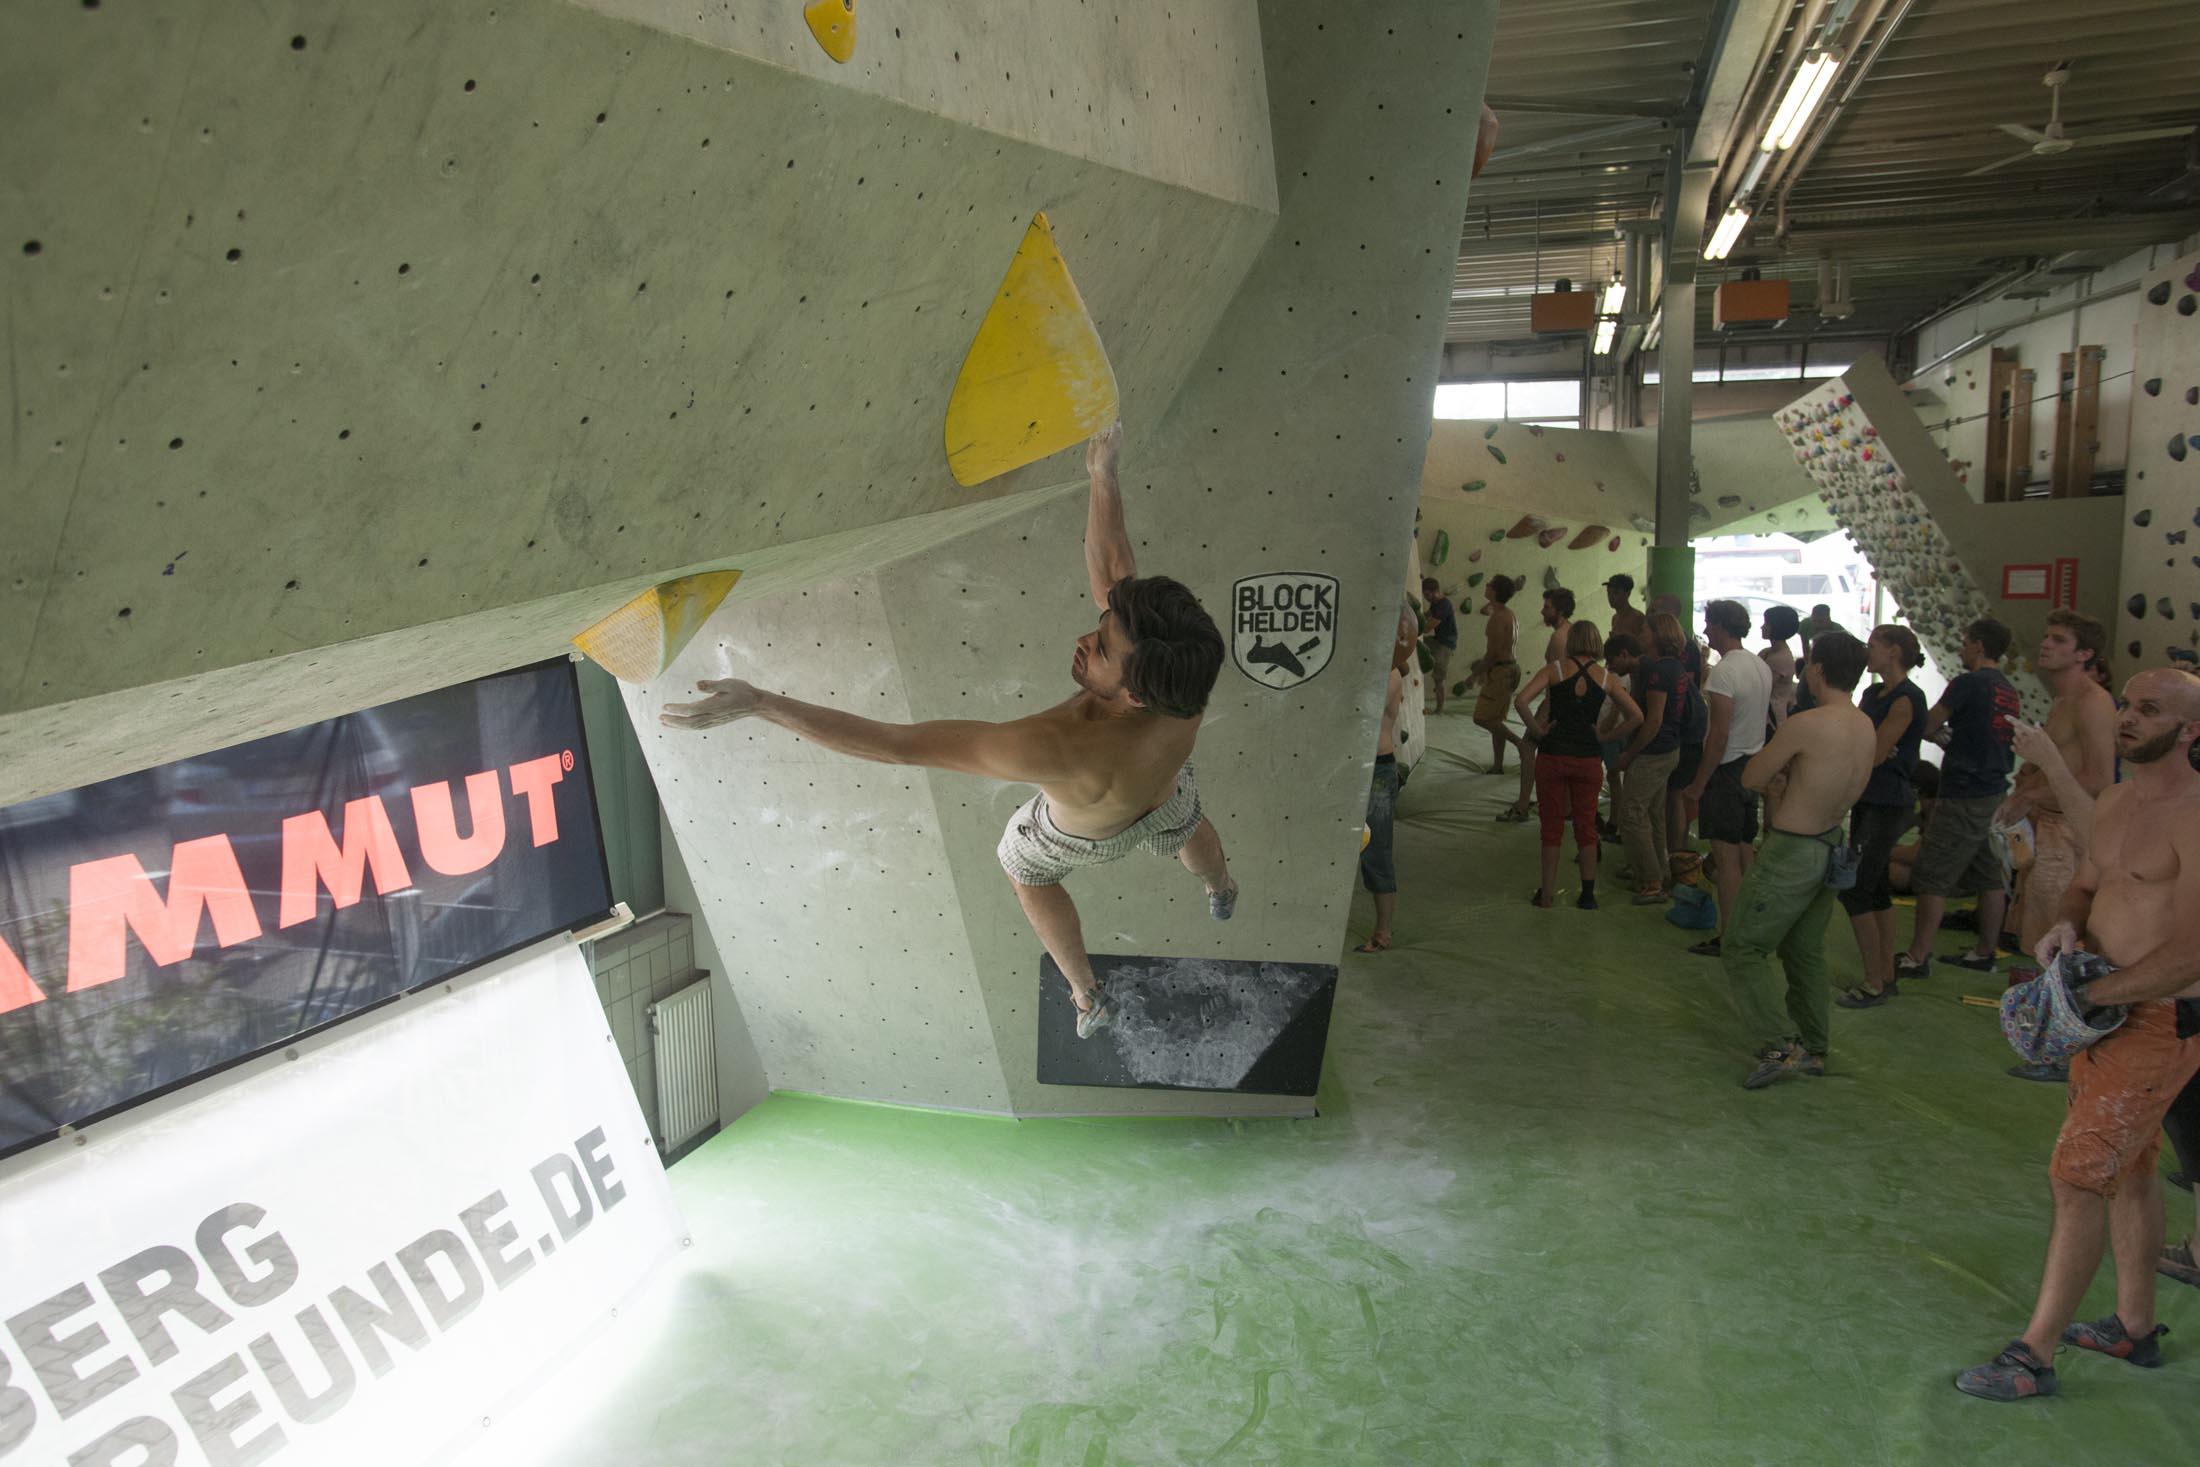 Quali, internationaler bouldercup Frankenjura 2016, BLOCKHELDEN Erlangen, Mammut, Bergfreunde.de, Boulderwettkampf07092016392